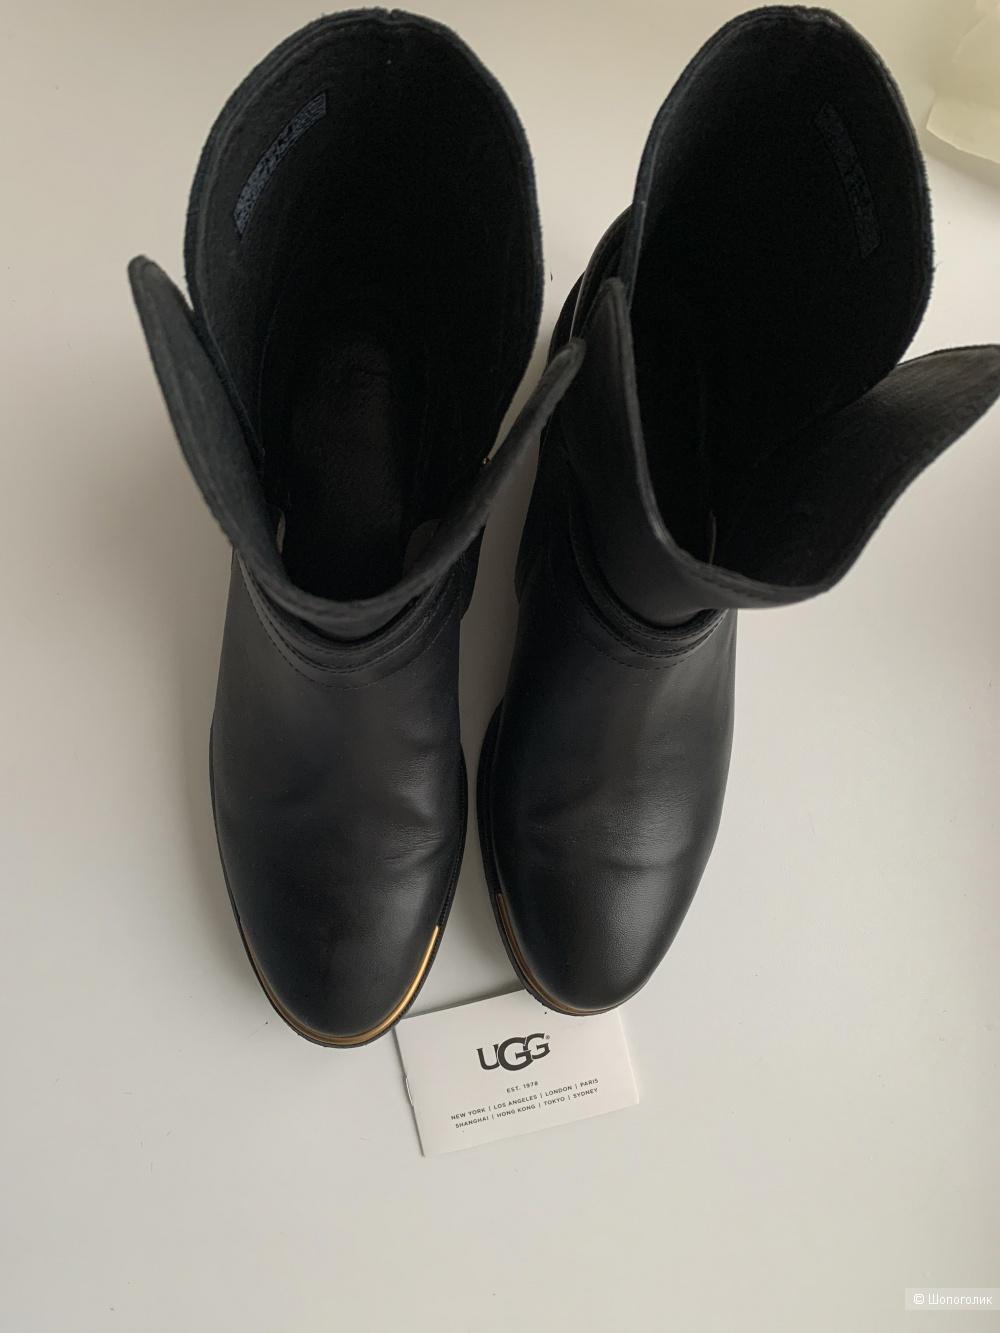 Сапоги UGG , размер US 9,5